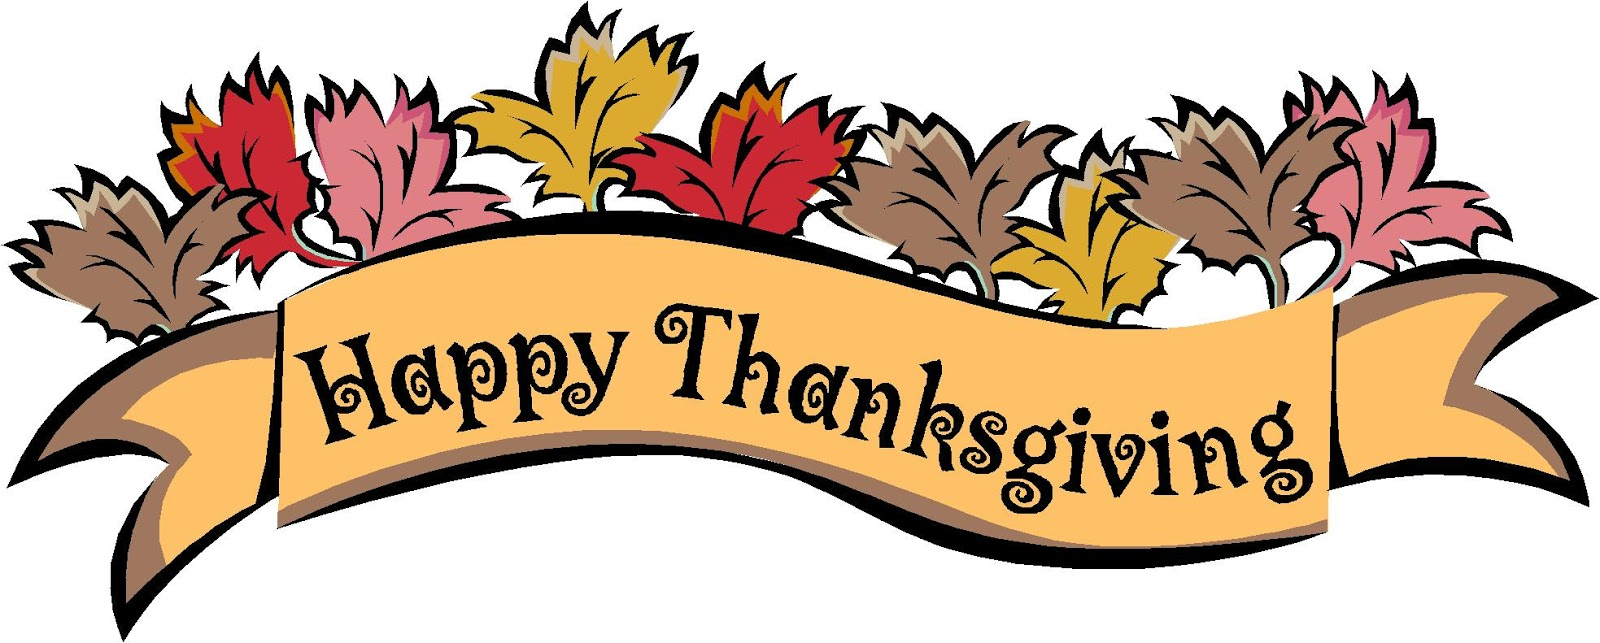 Religious thanksgiving clip art clipart.